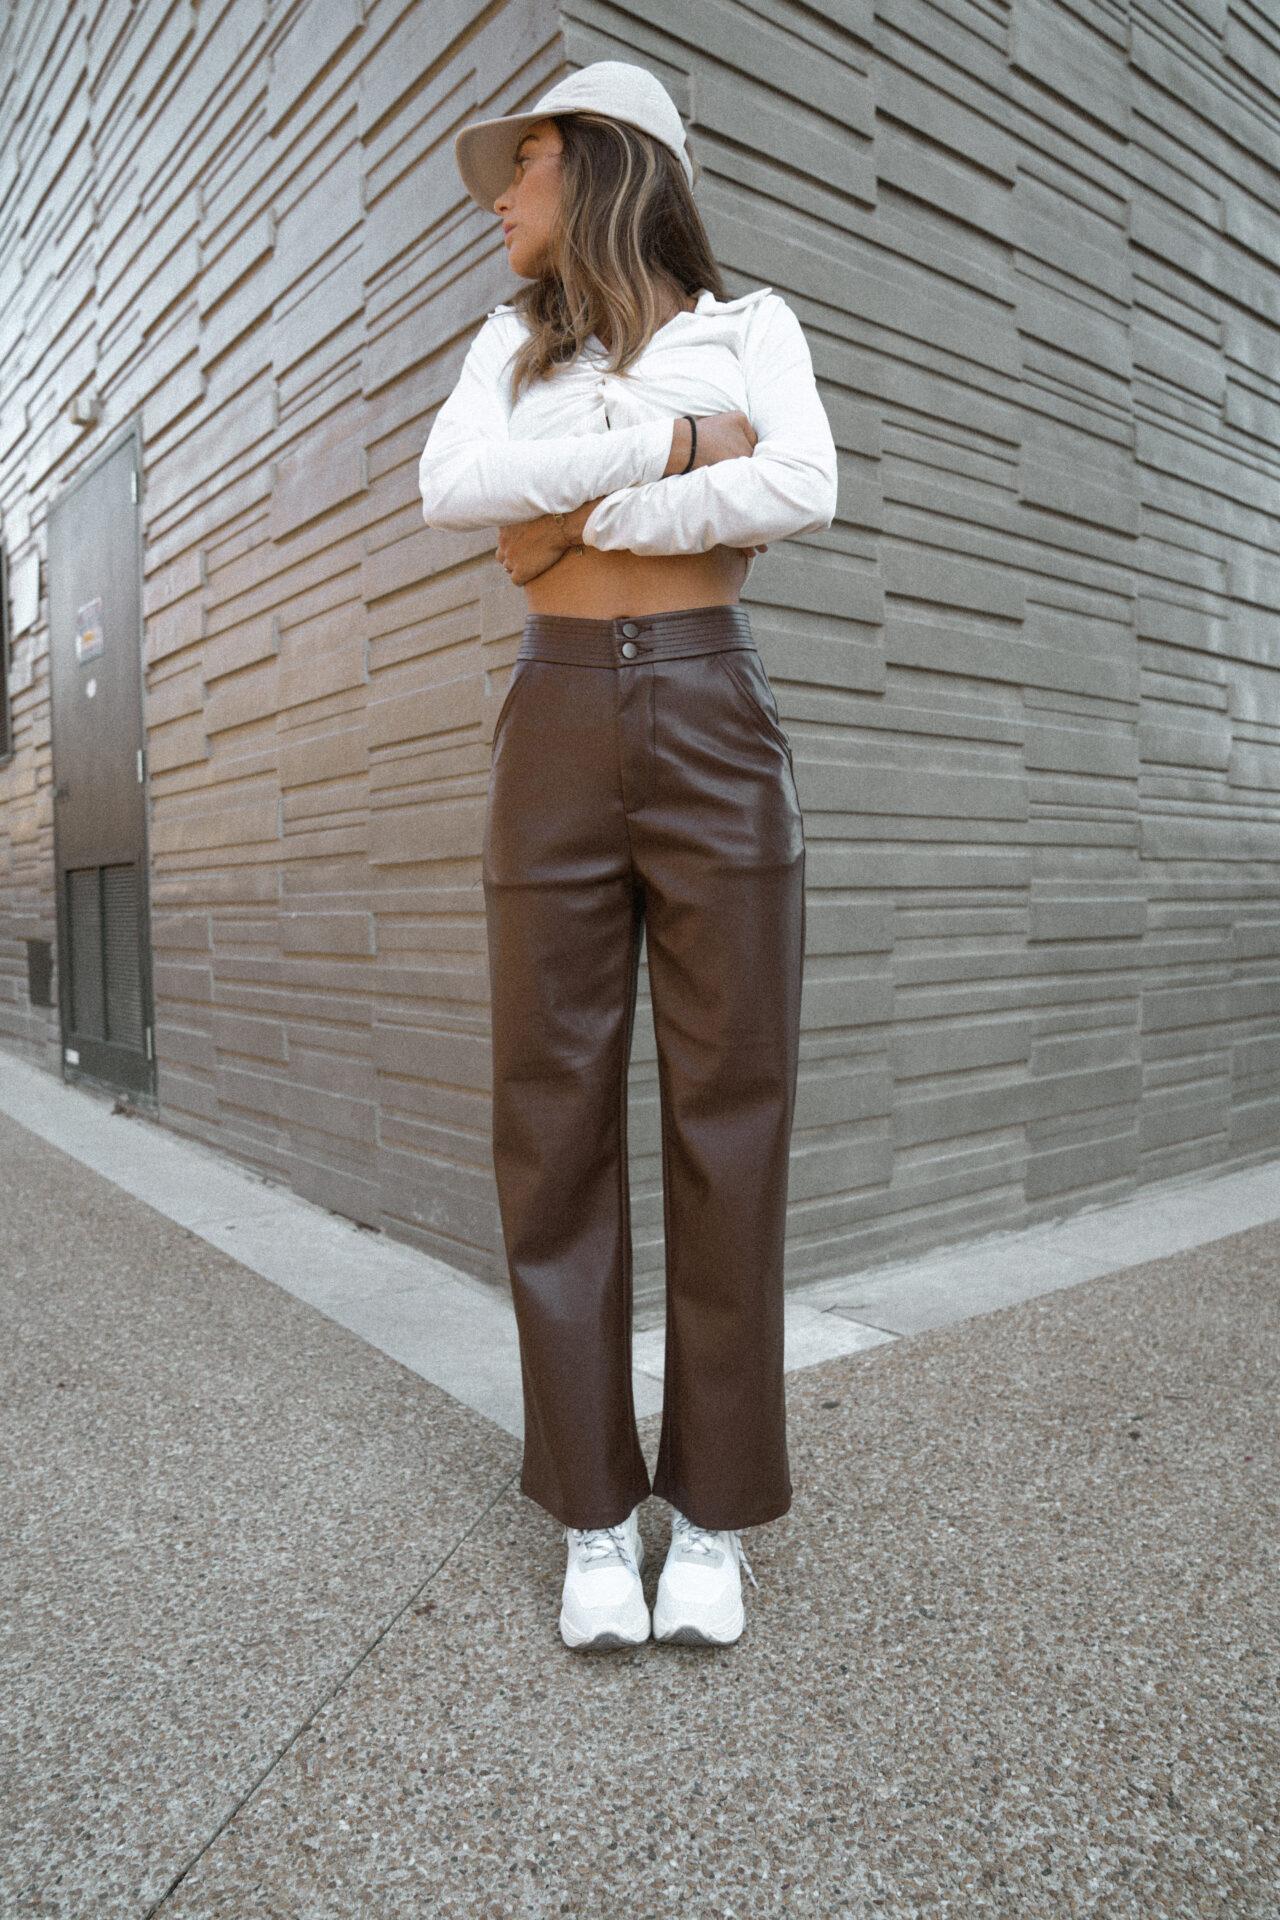 pantalon-simili-cuir-marron-chocolat-femme-gisette-store (24)